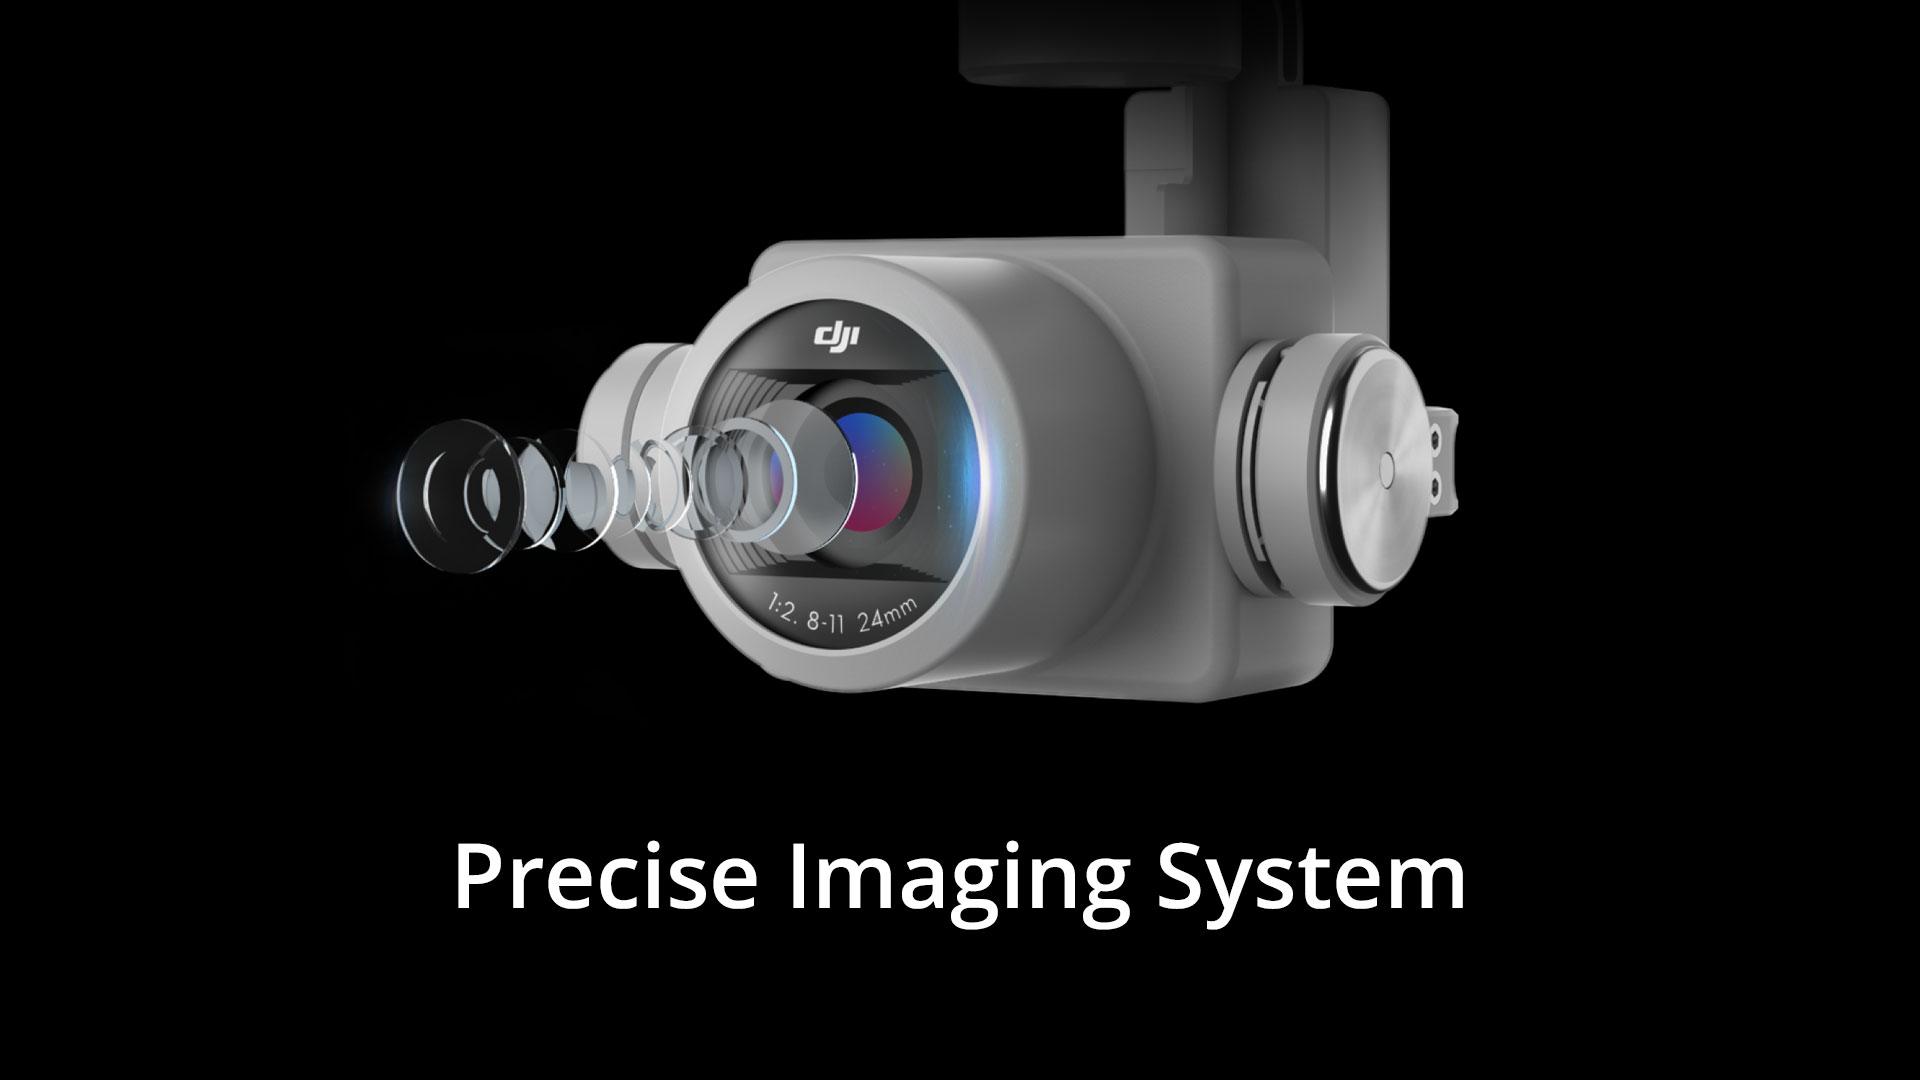 DJI Phantom 4 RTK Precise Imaging System